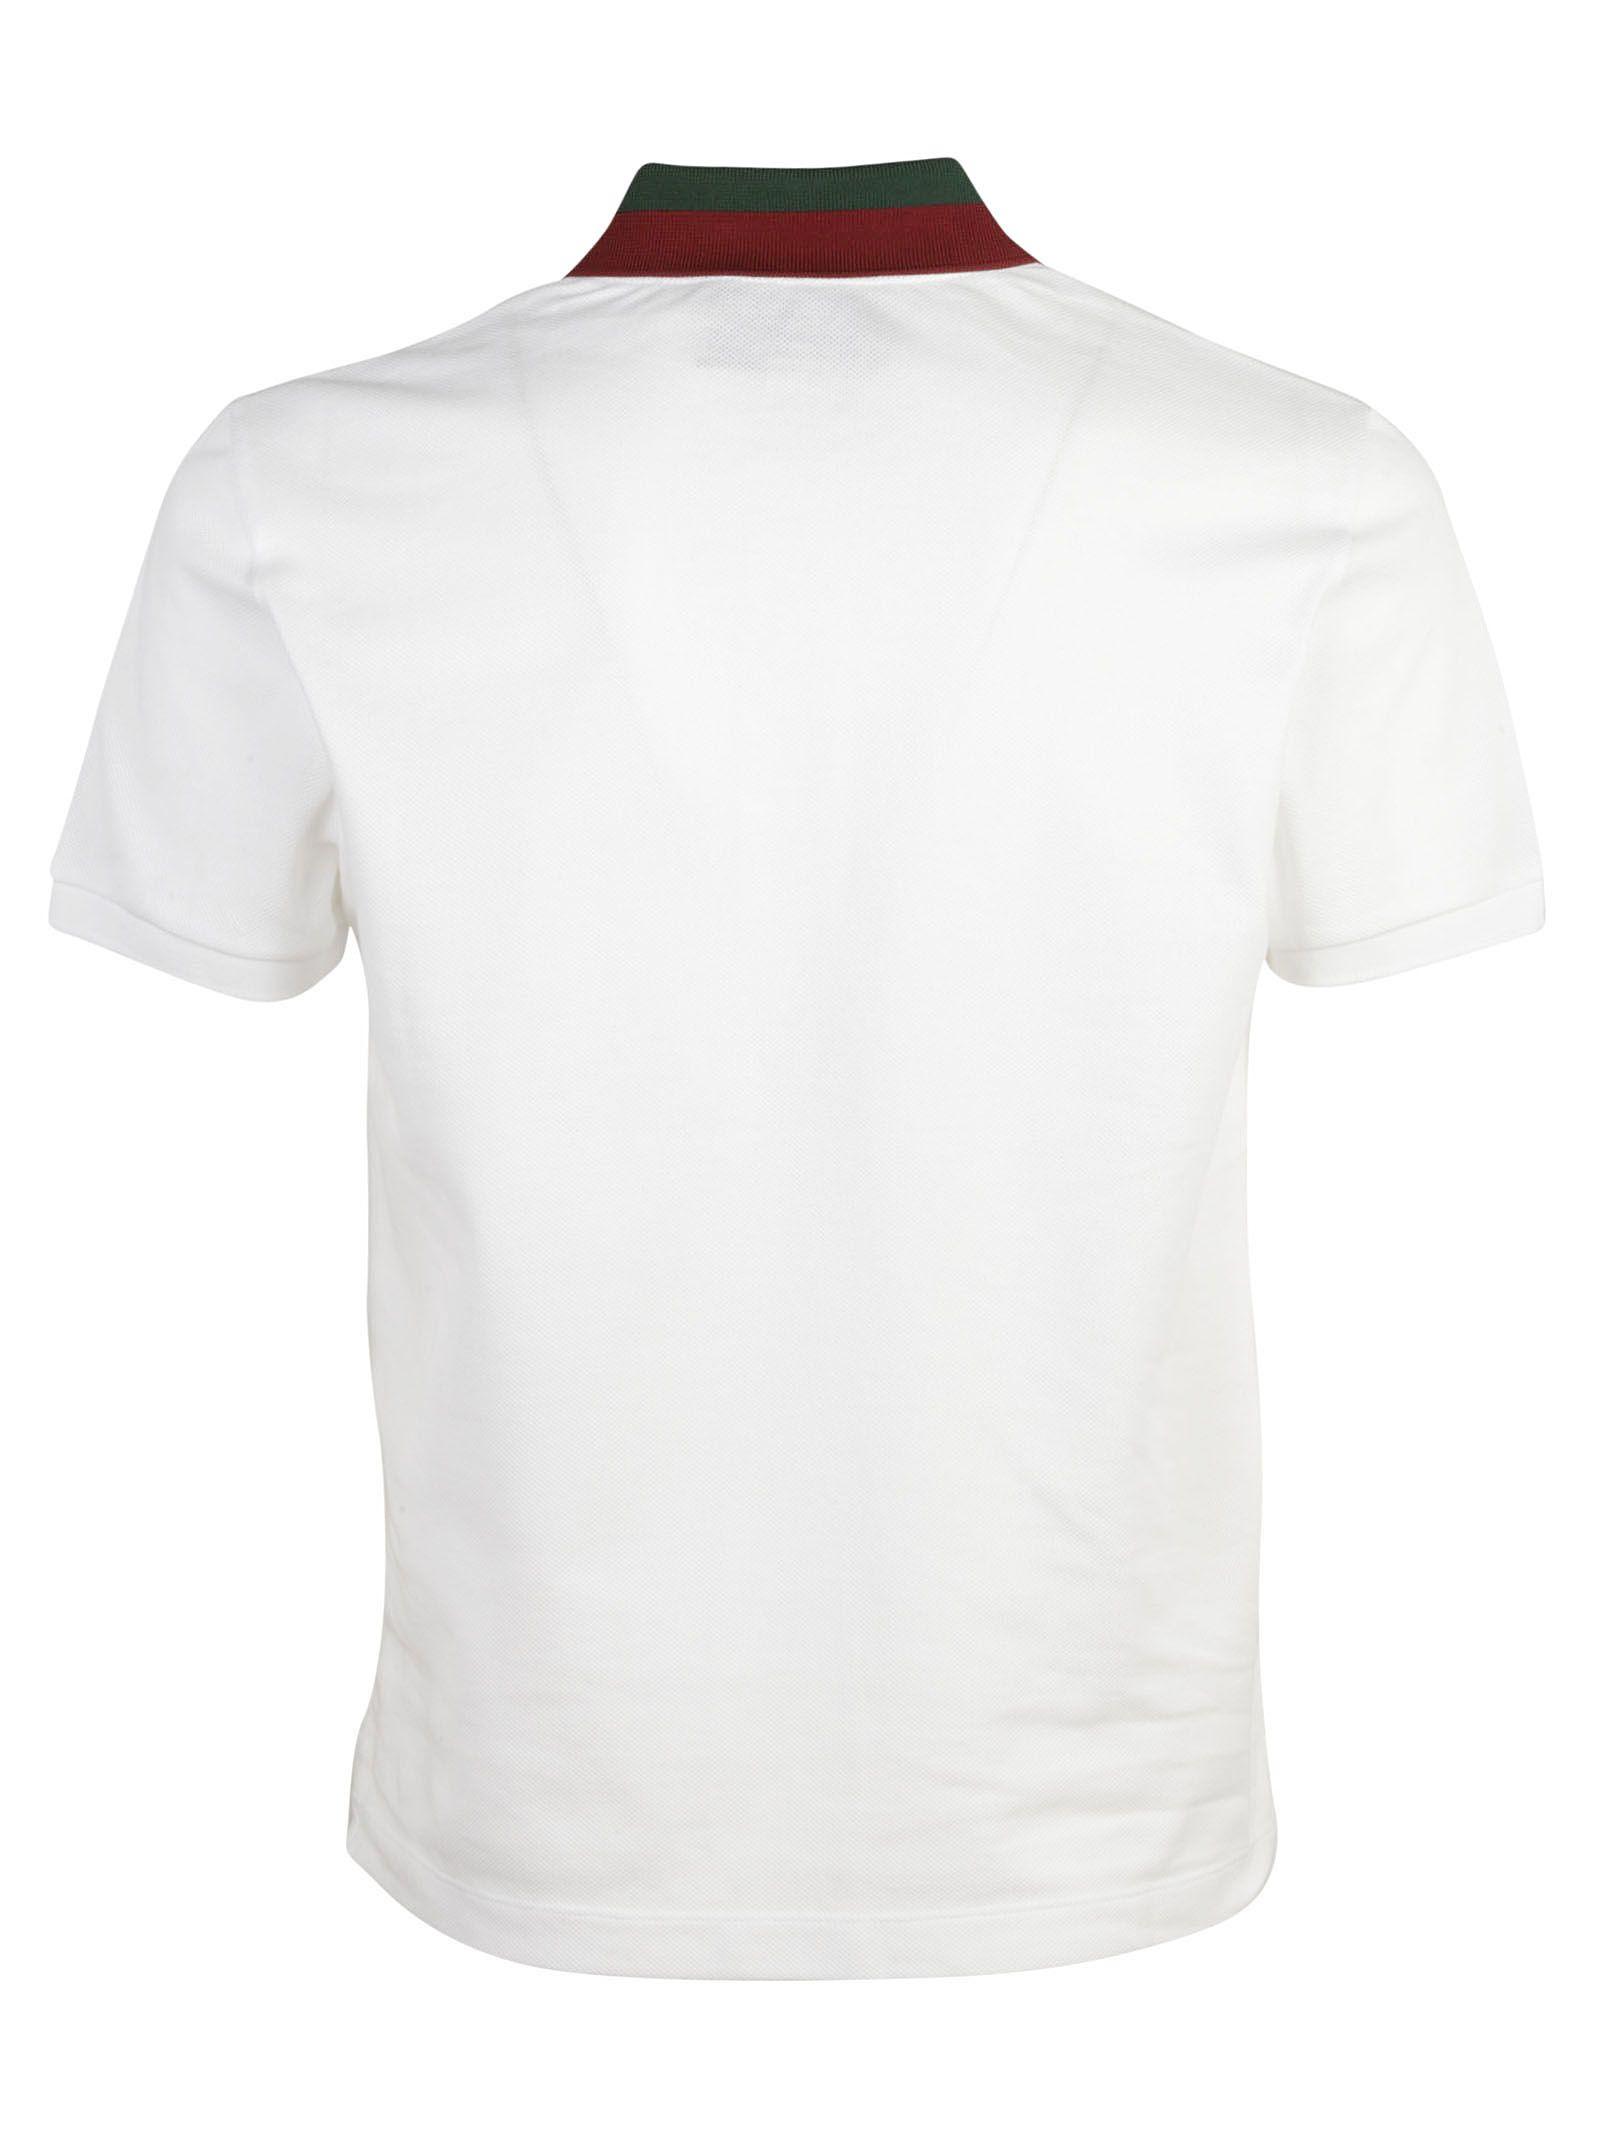 cb2a9254076a ... Clothing Outlet Source · Gucci Polo T Shirt Sale Lauren Goss